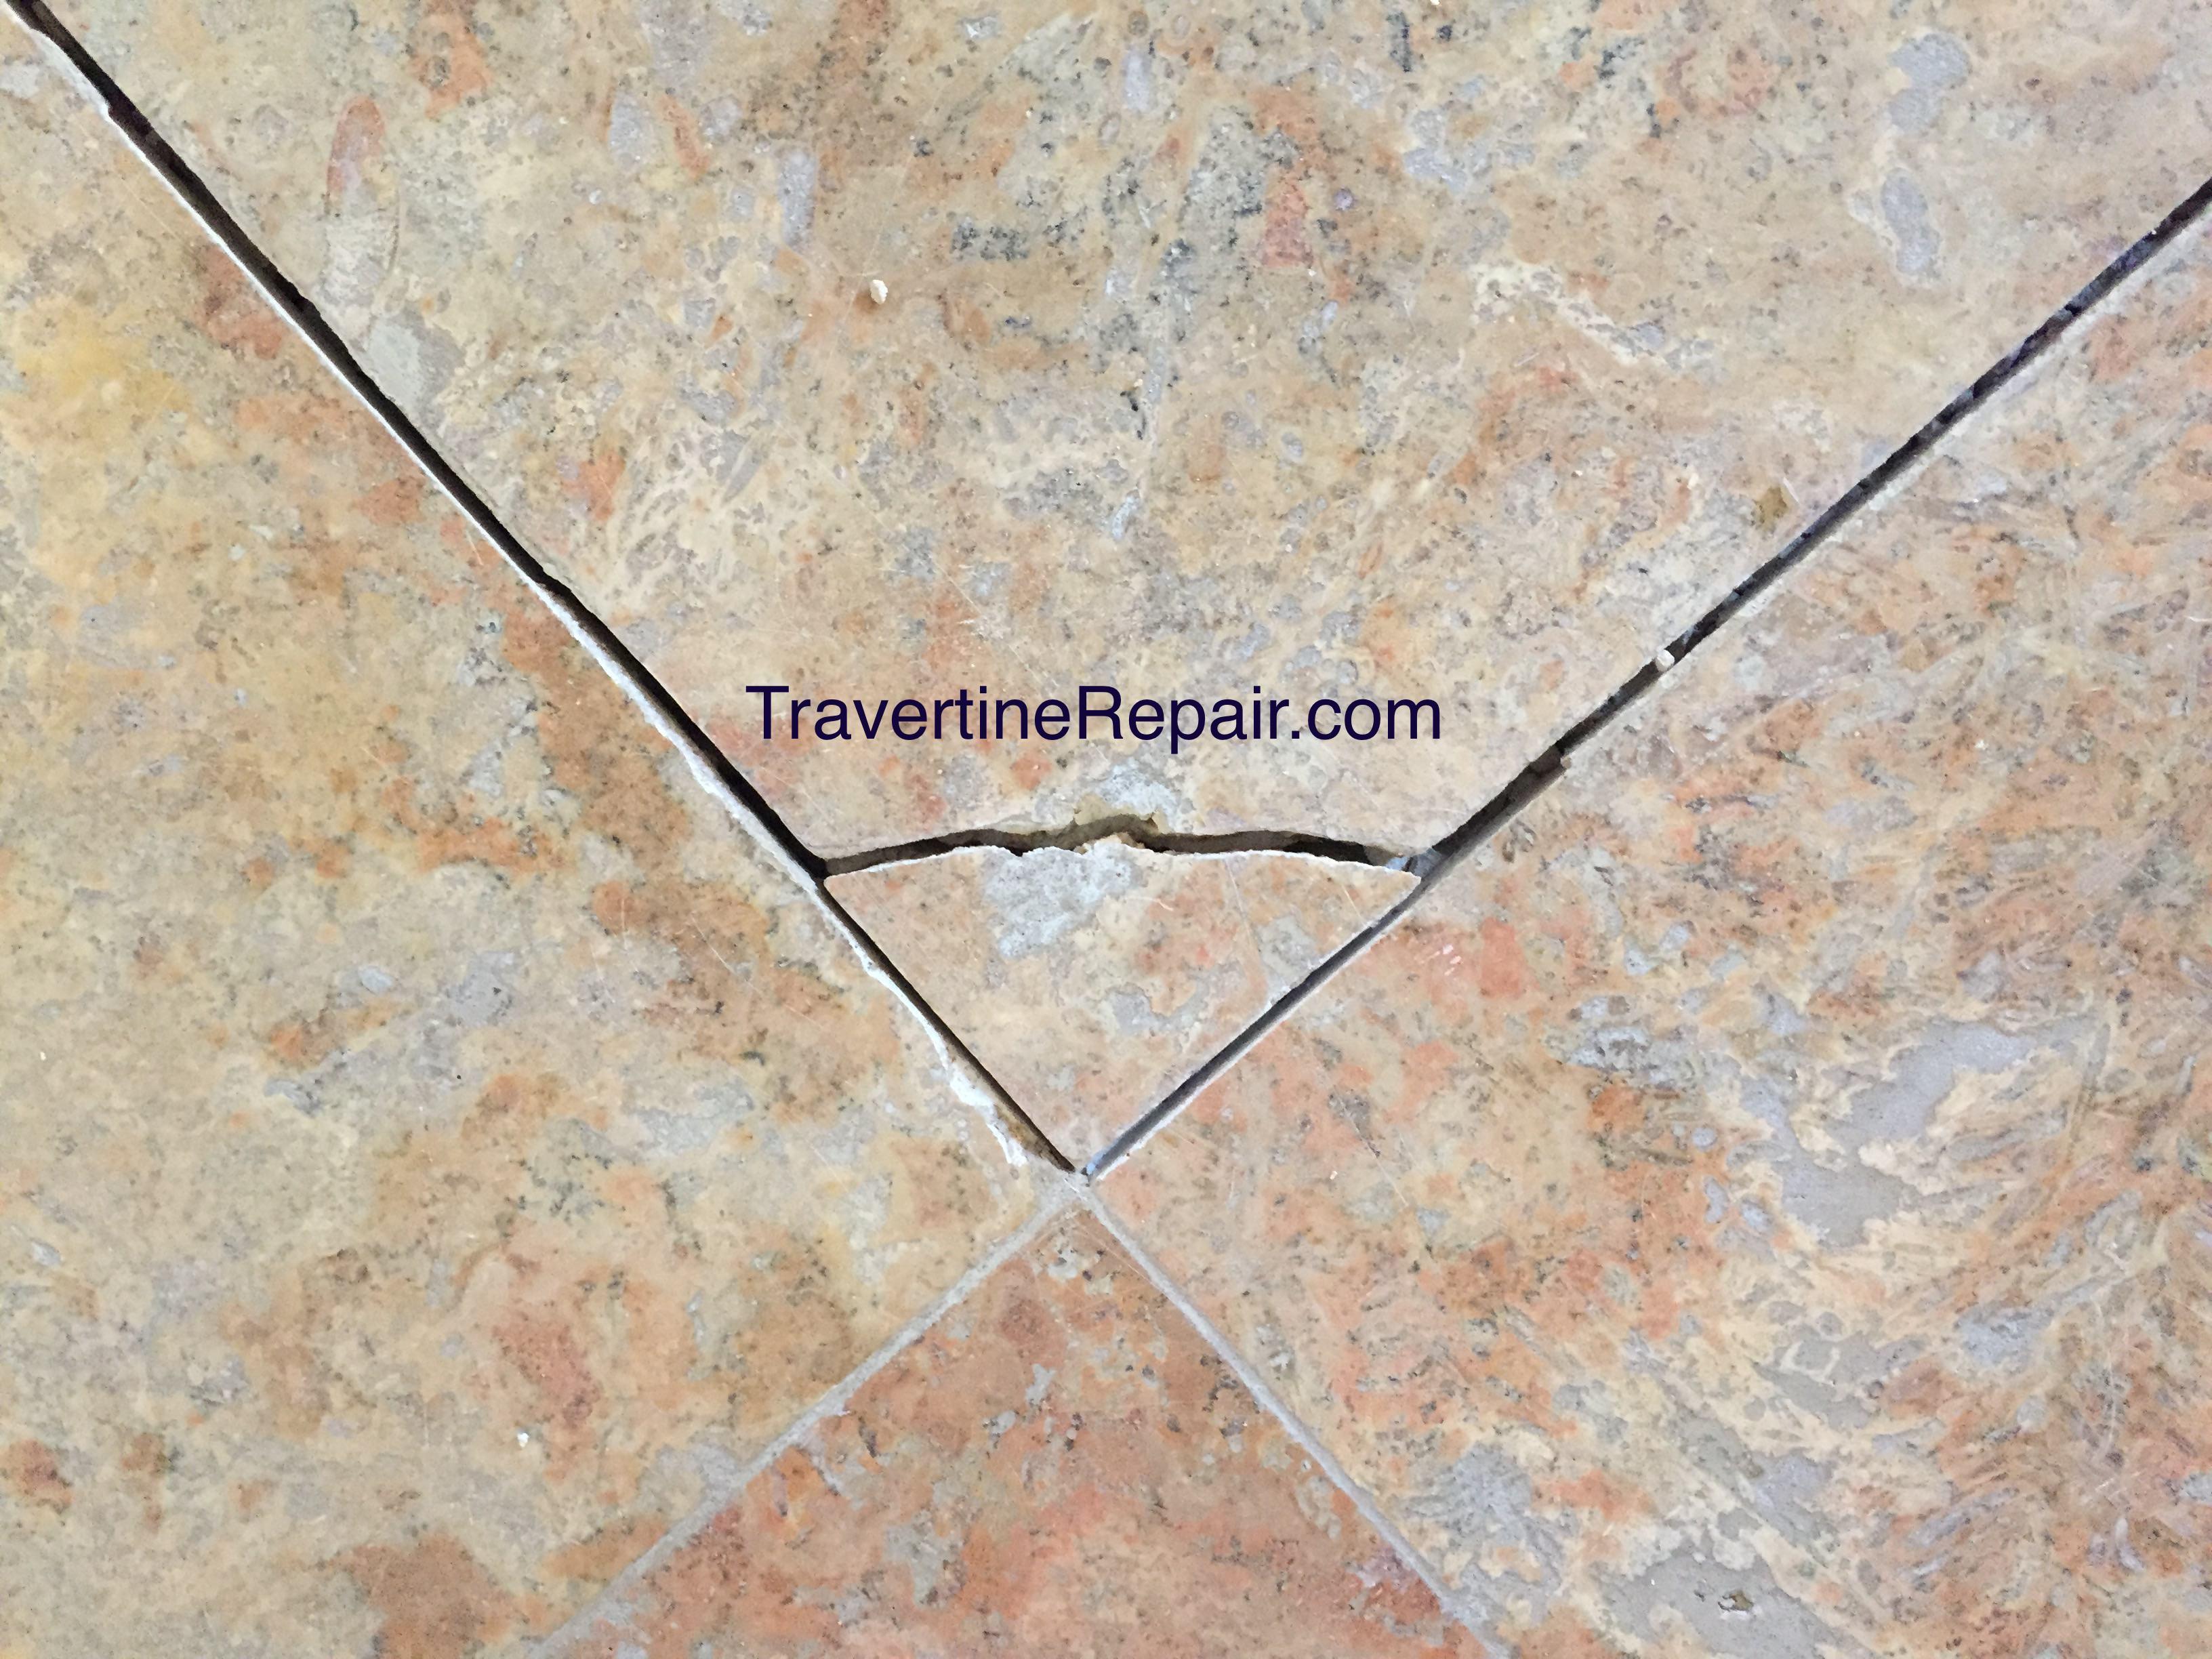 Scottsdale Travertine Repair And Sealing Crack And Chip